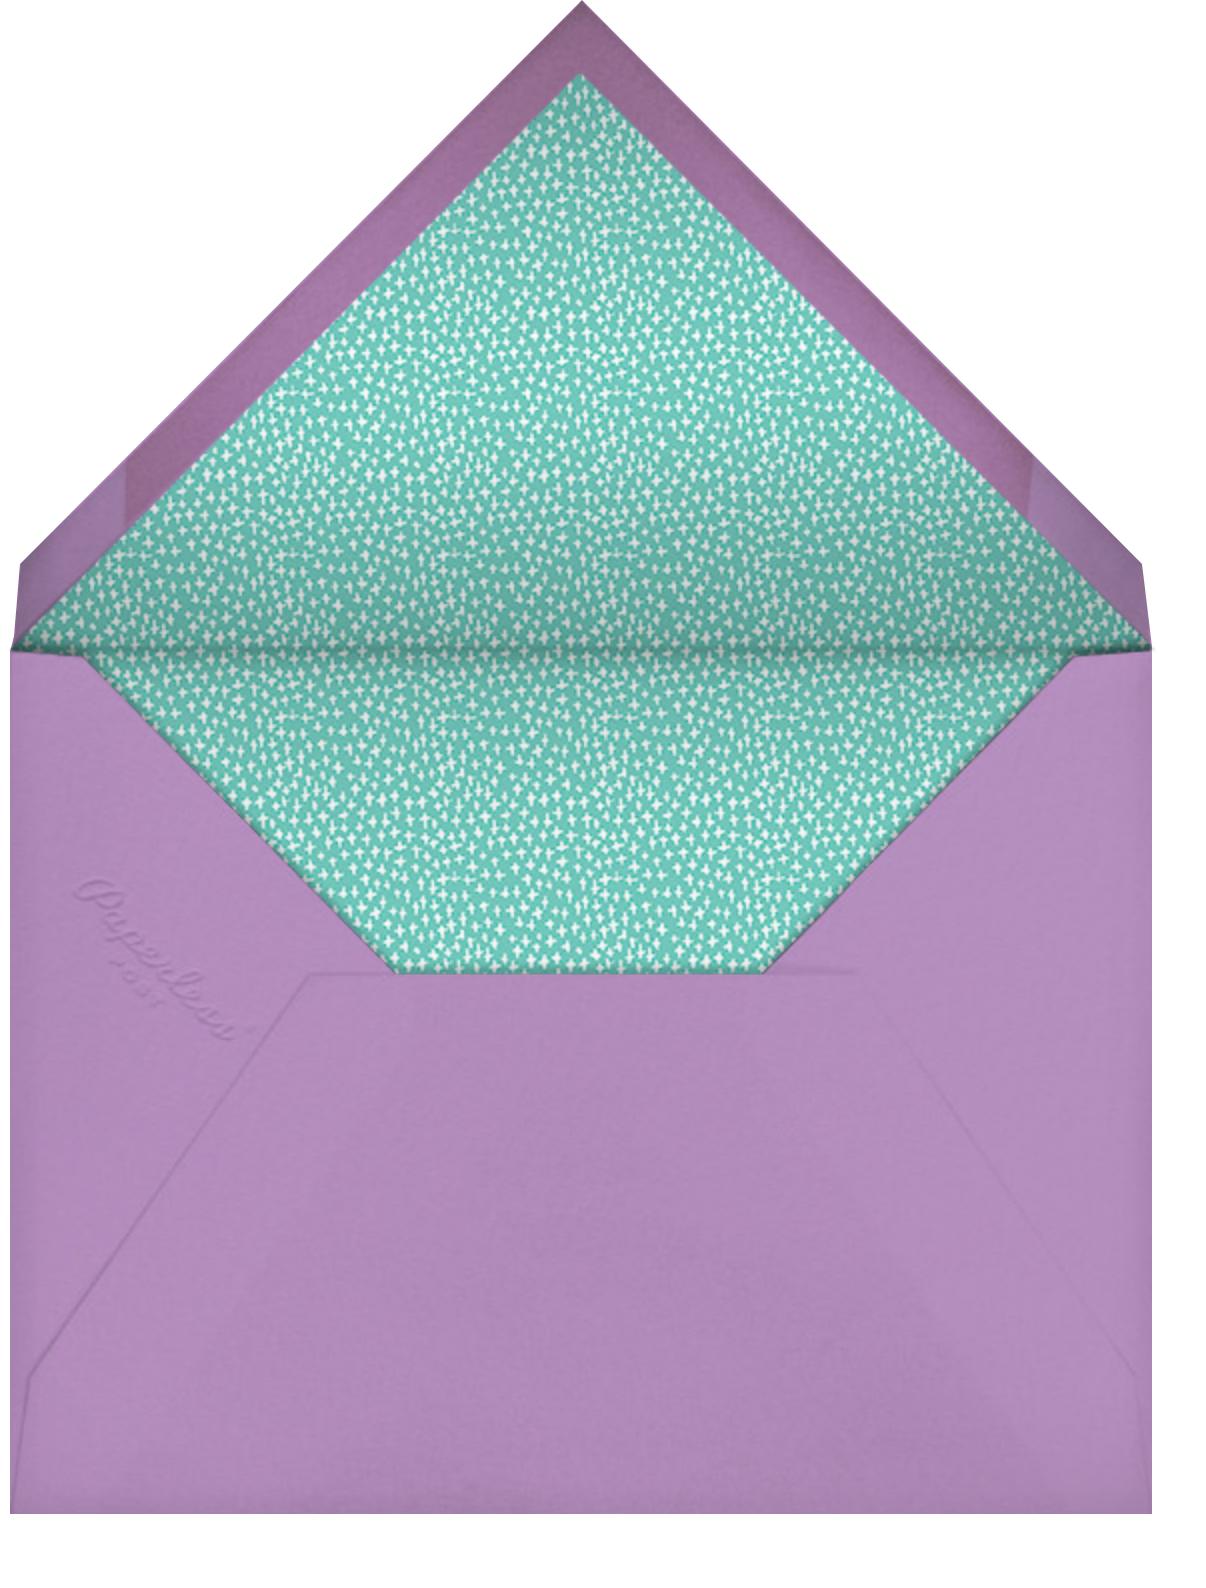 Bring your PJs - Mr. Boddington's Studio - Kids' birthday - envelope back